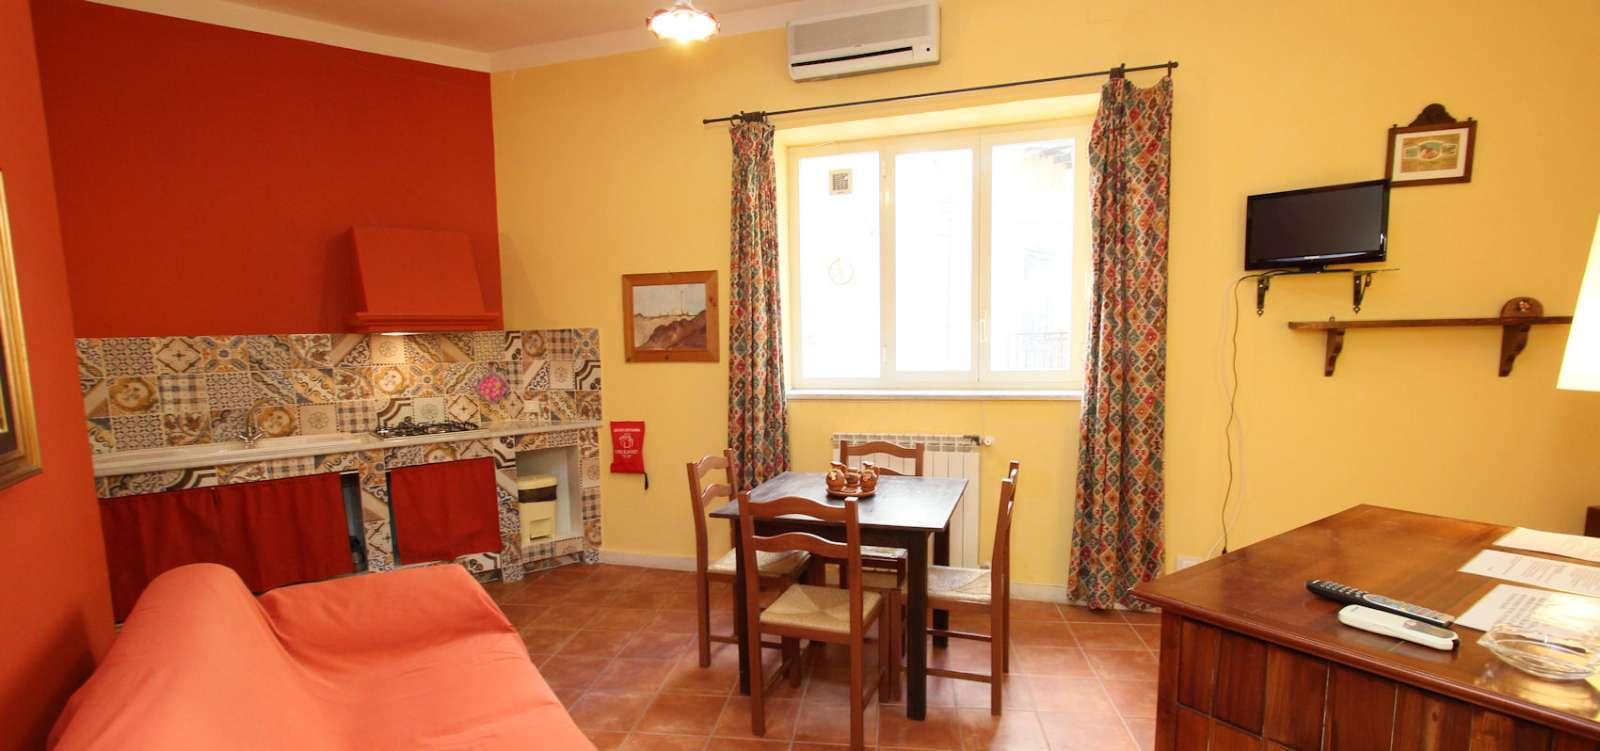 Wohnung Santuzza